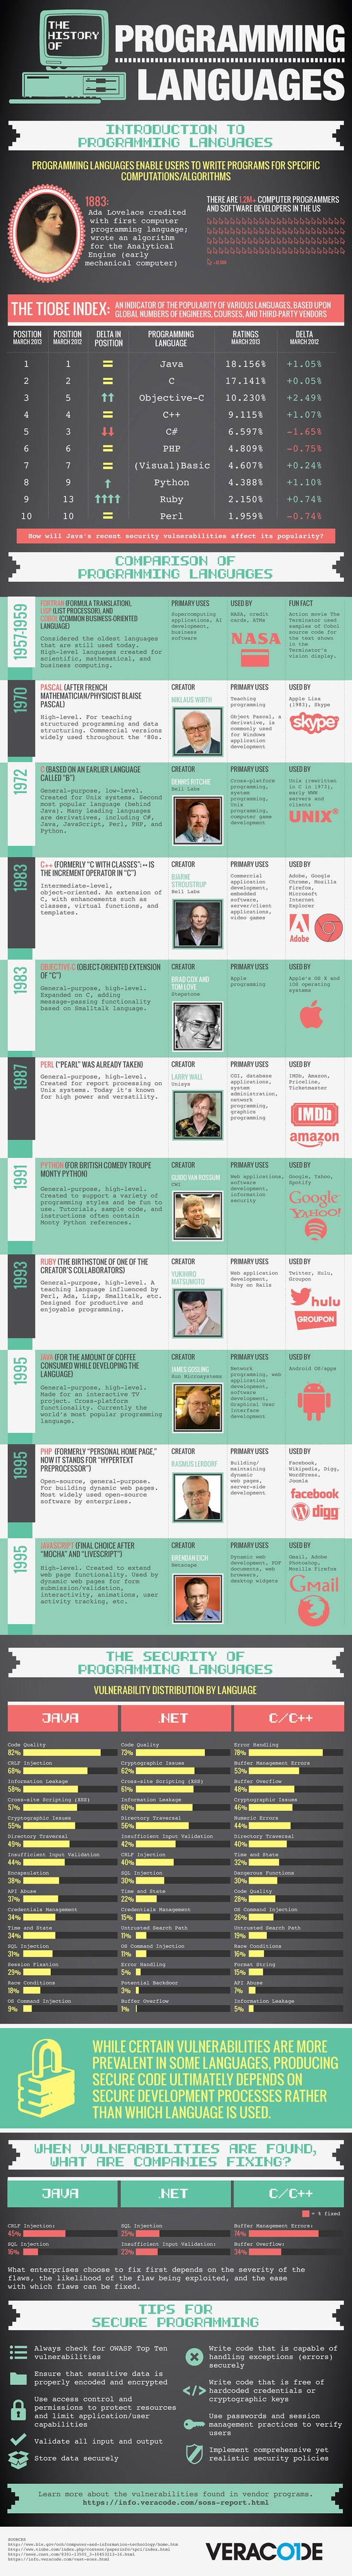 Historia de los lenguajes de programación #infografia #infographic #software